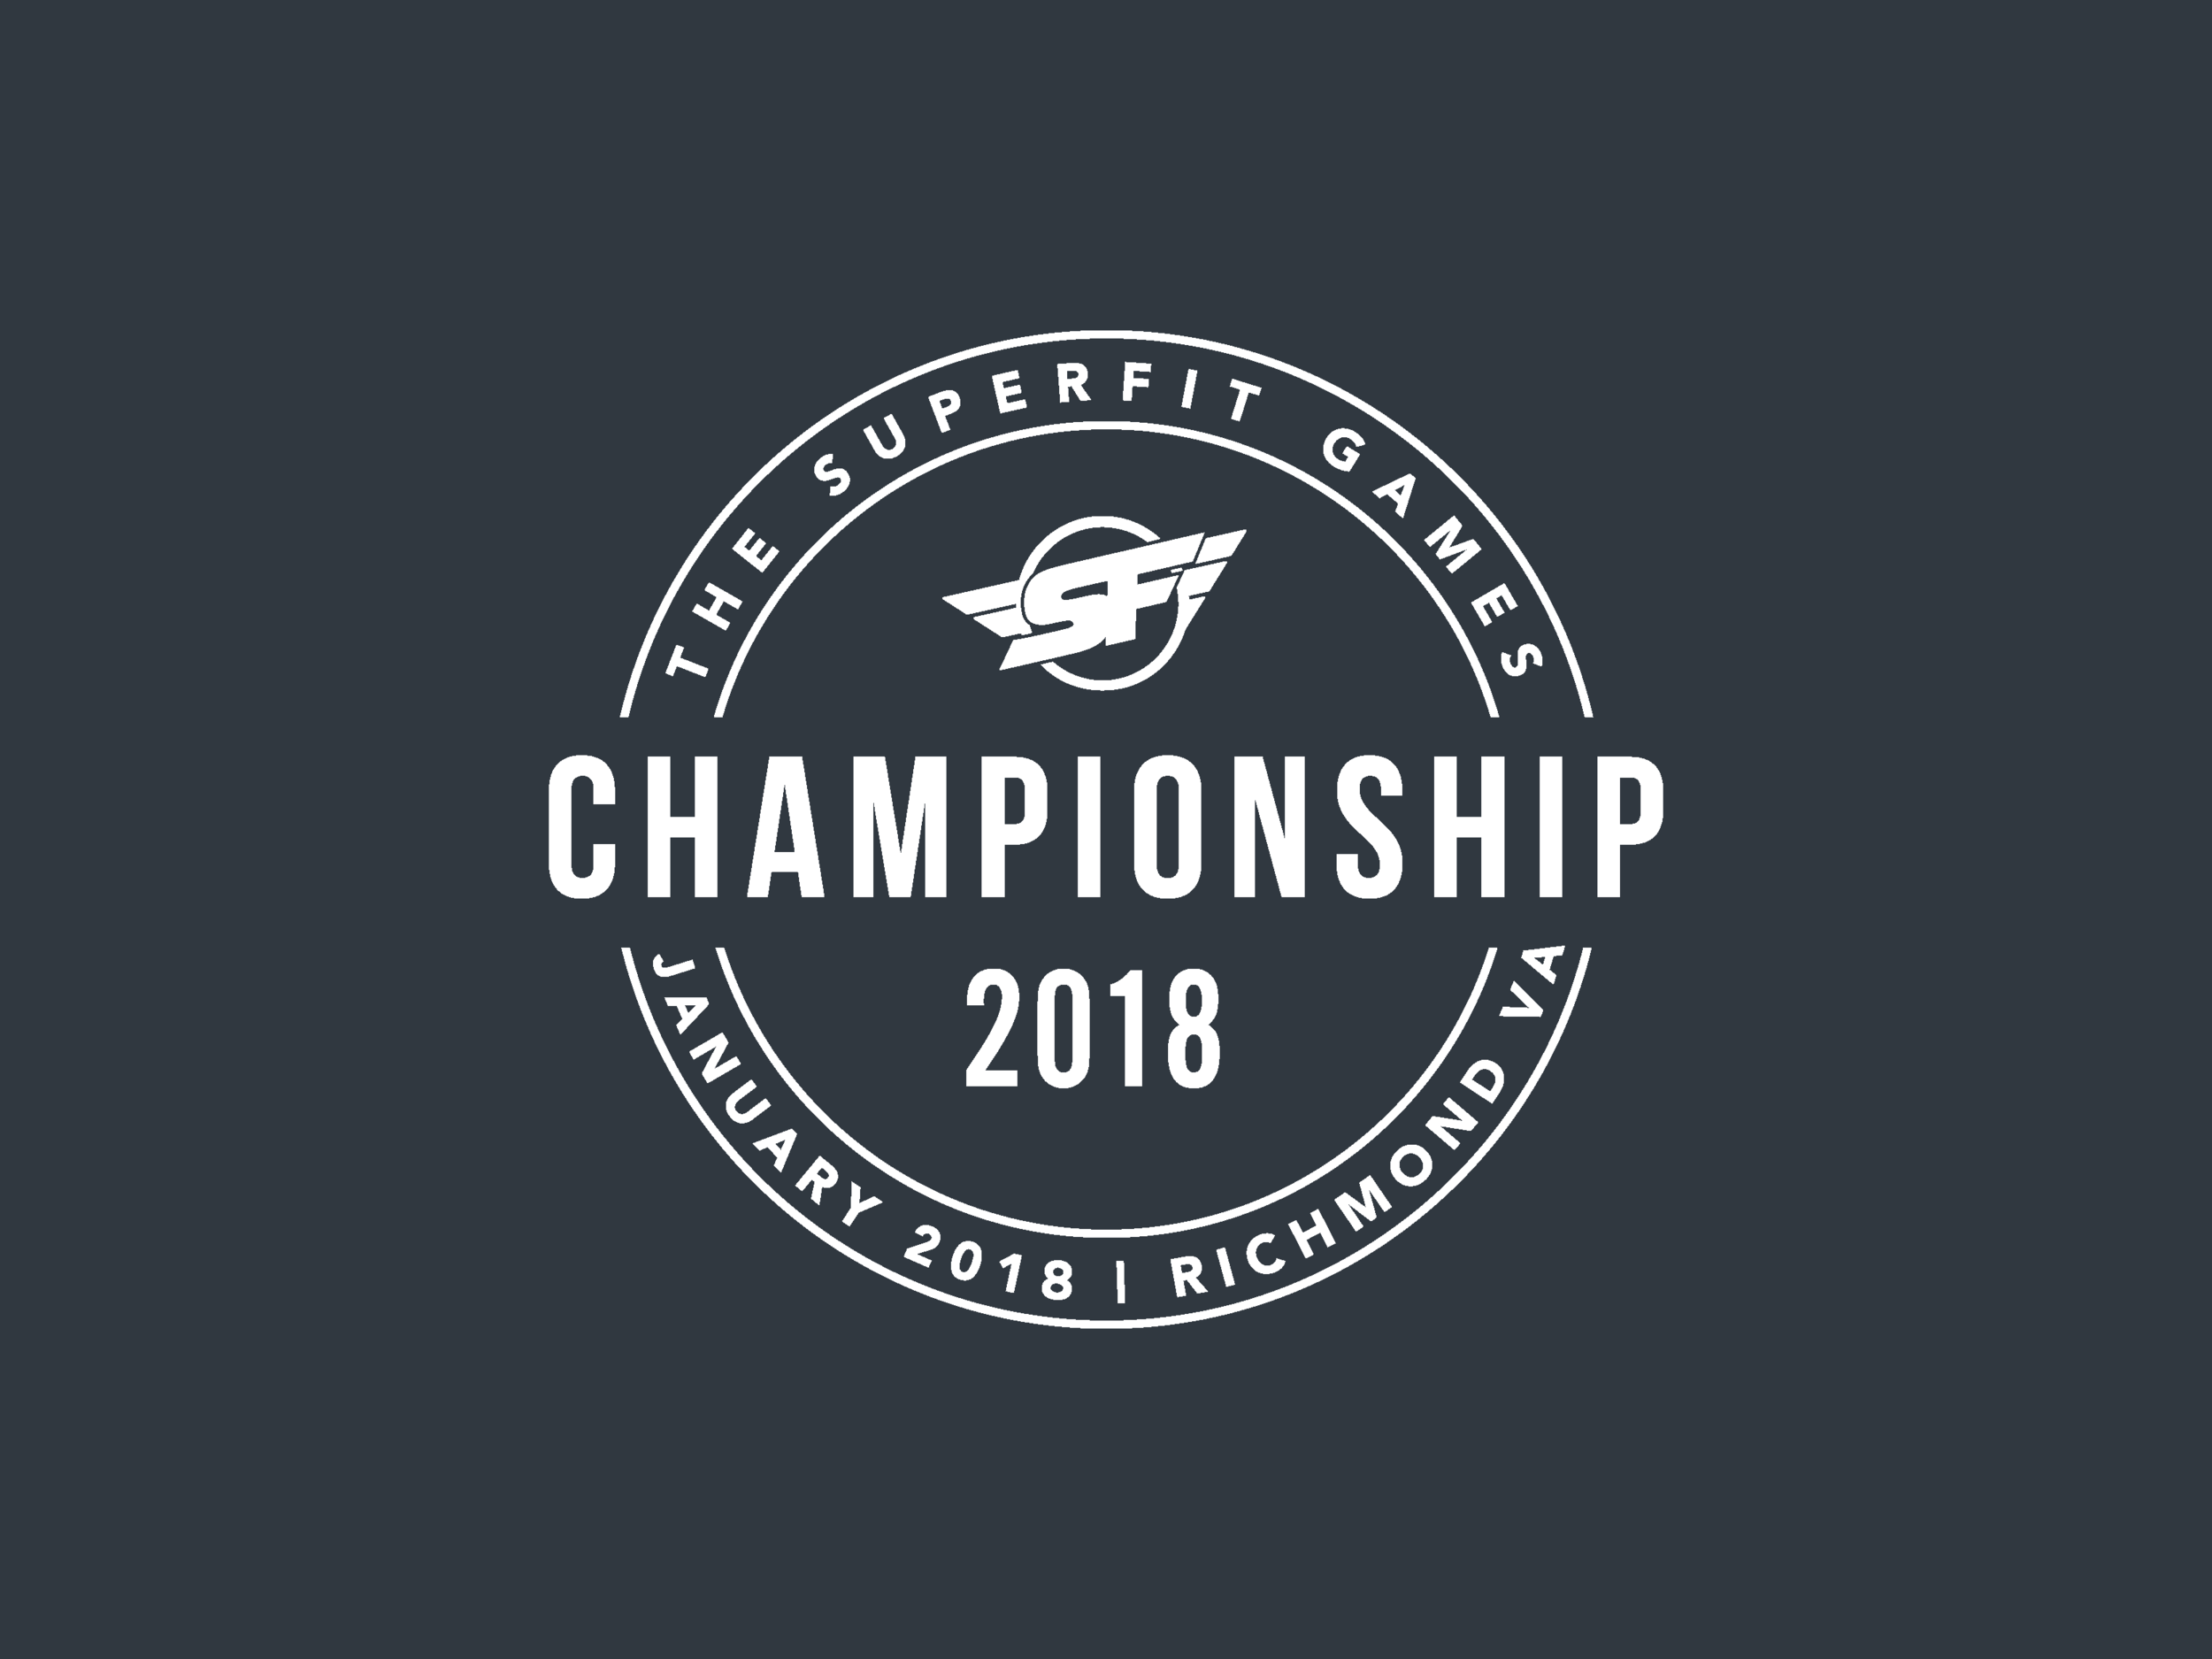 2017_southofbelmar_logo_design9.png